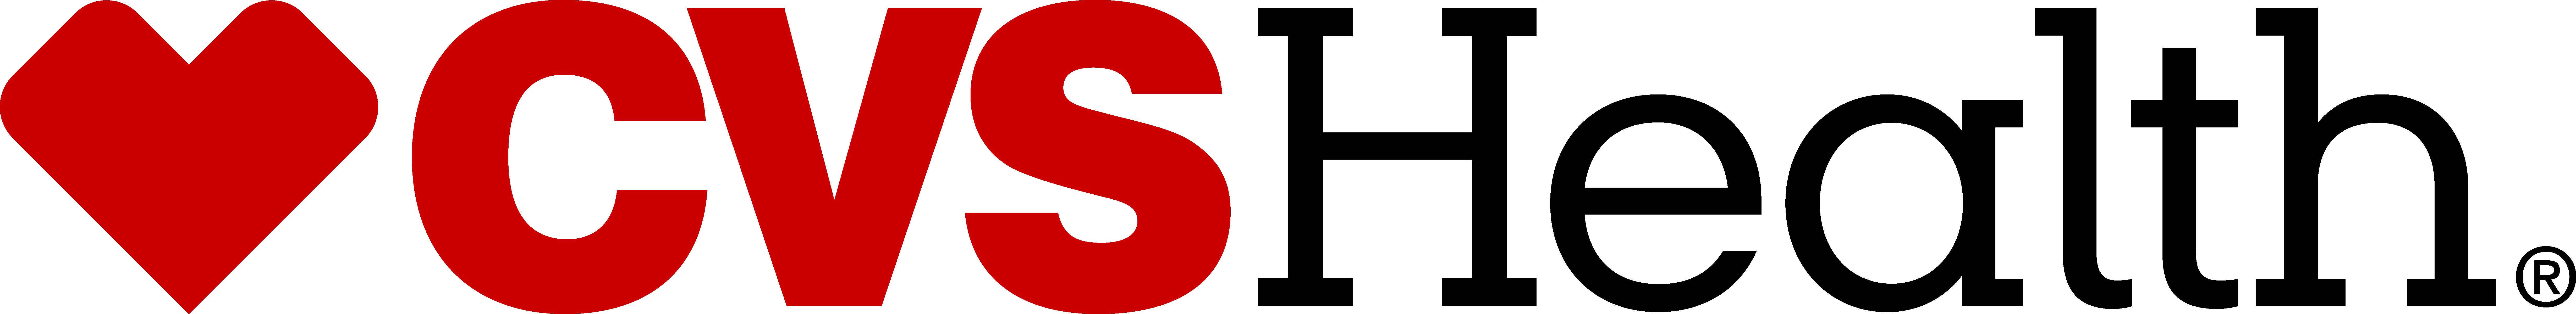 MyHR CVS Health Caremark Logo